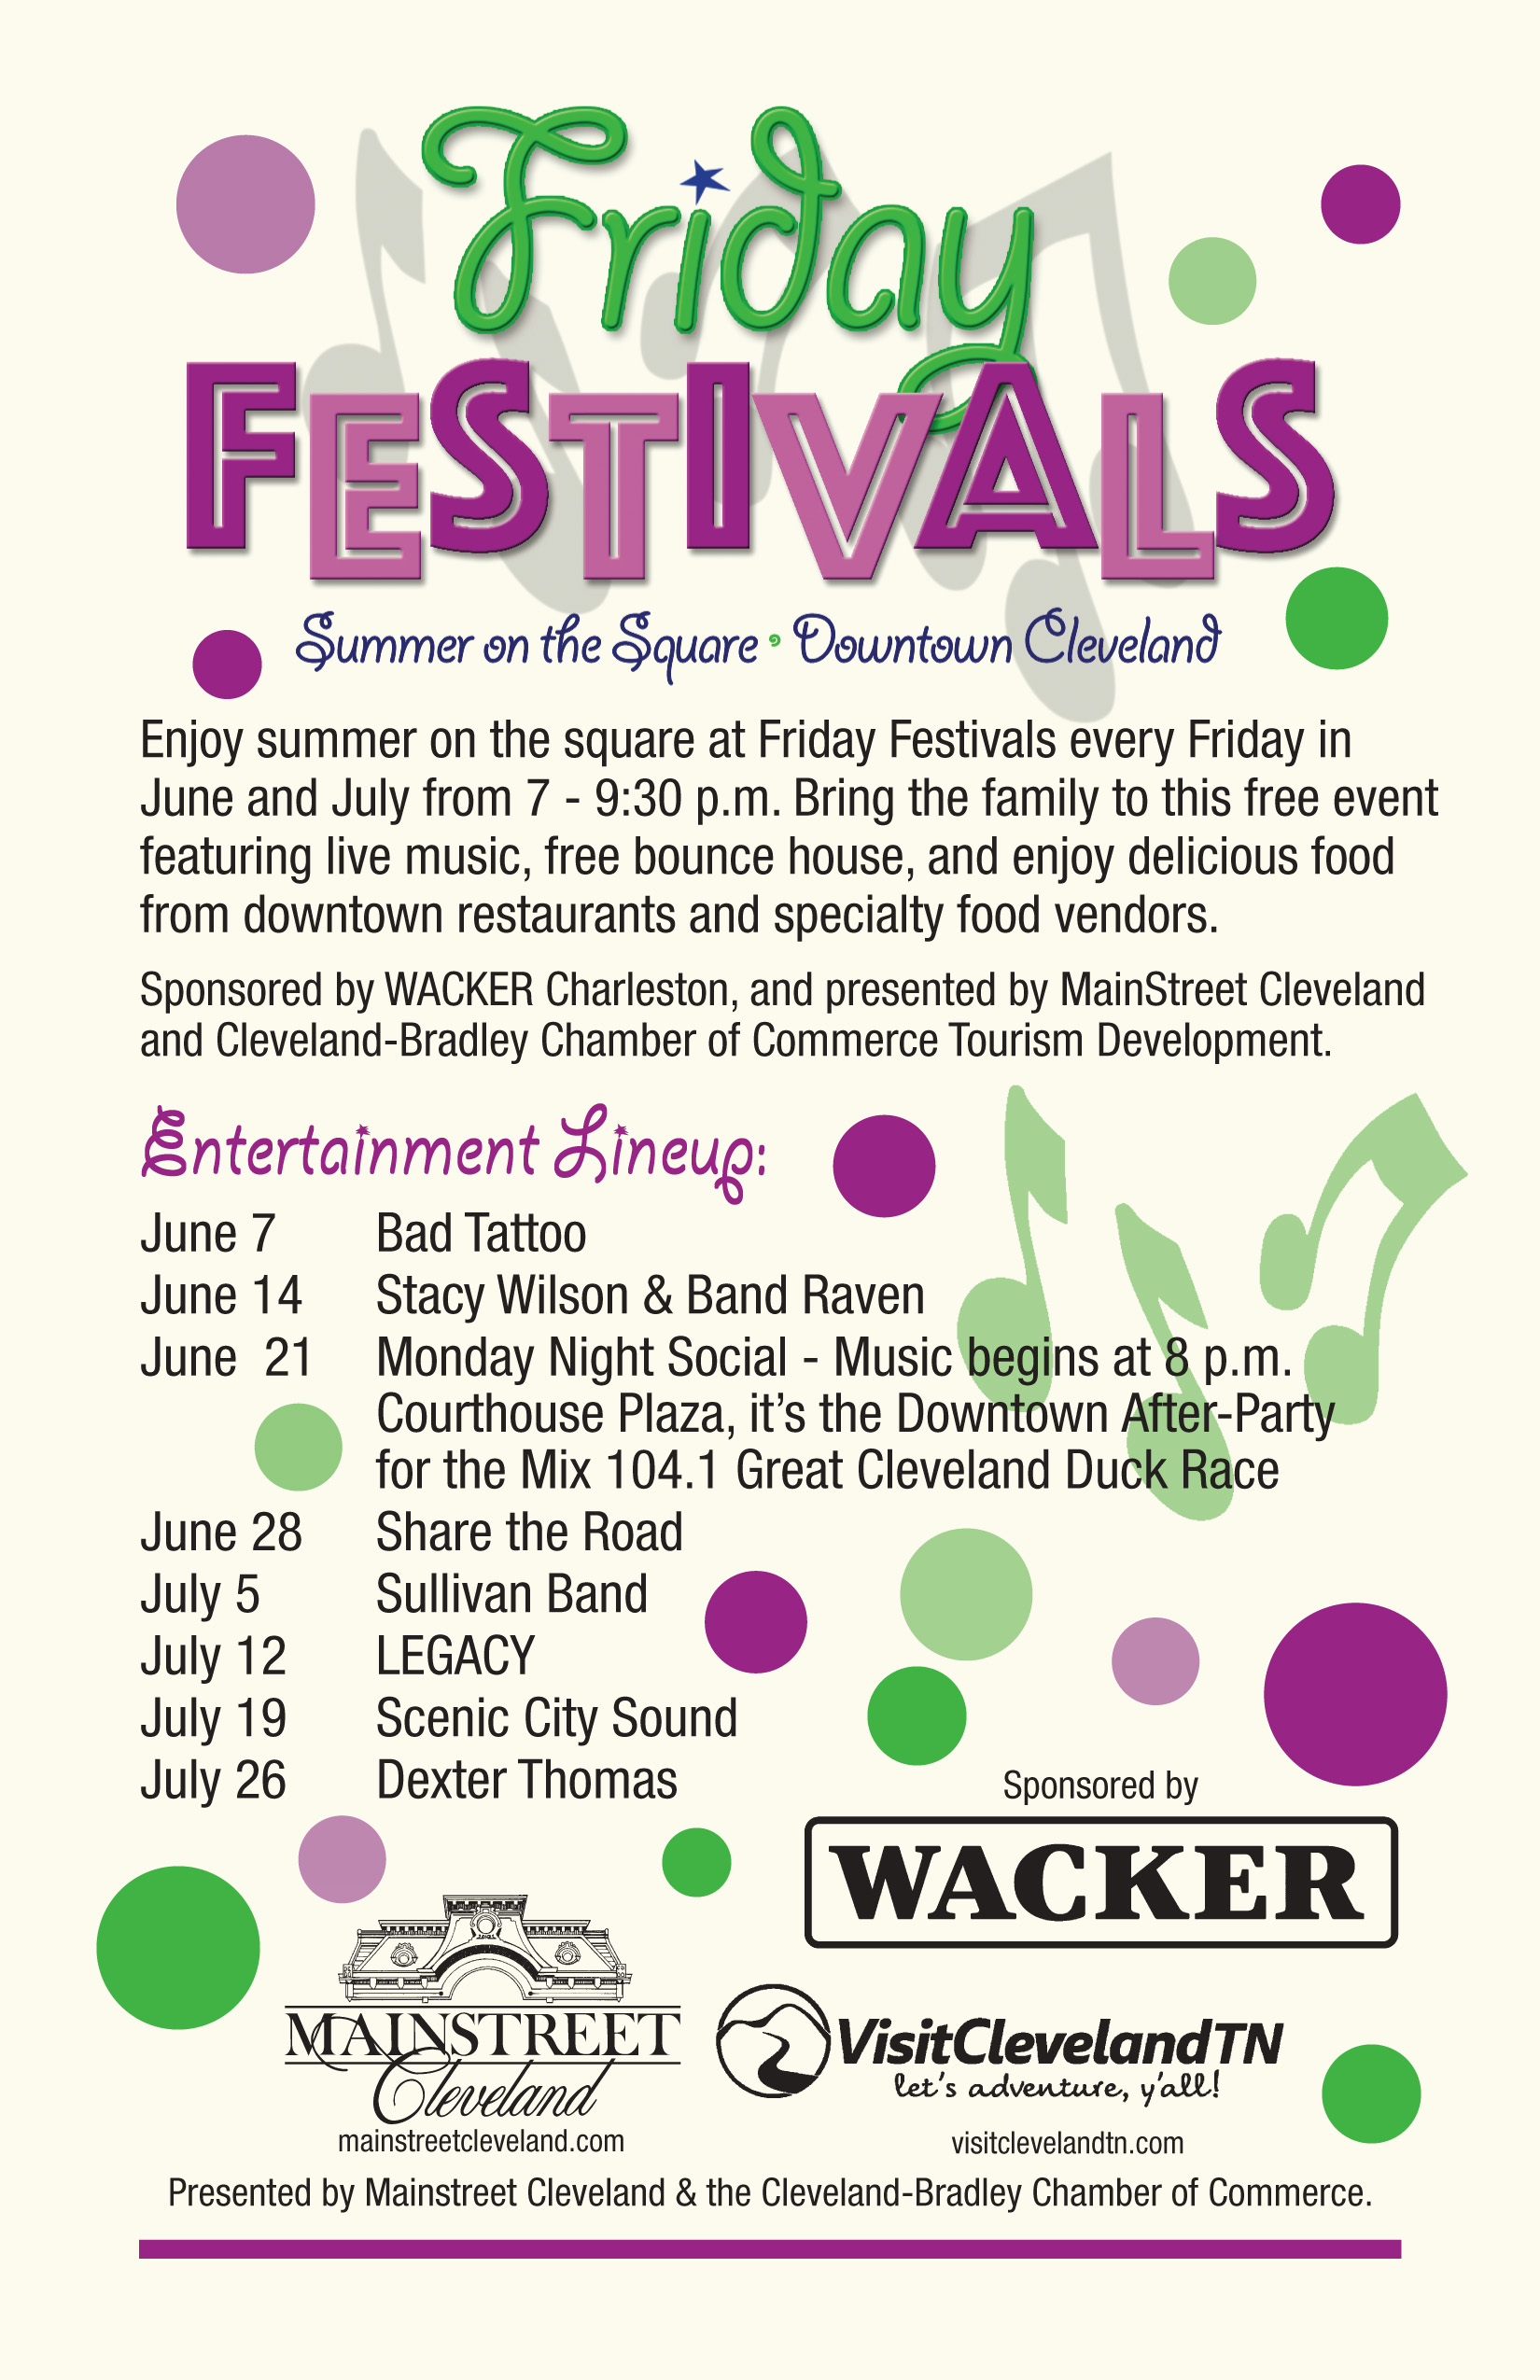 Friday Festivals - Visit Cleveland TN